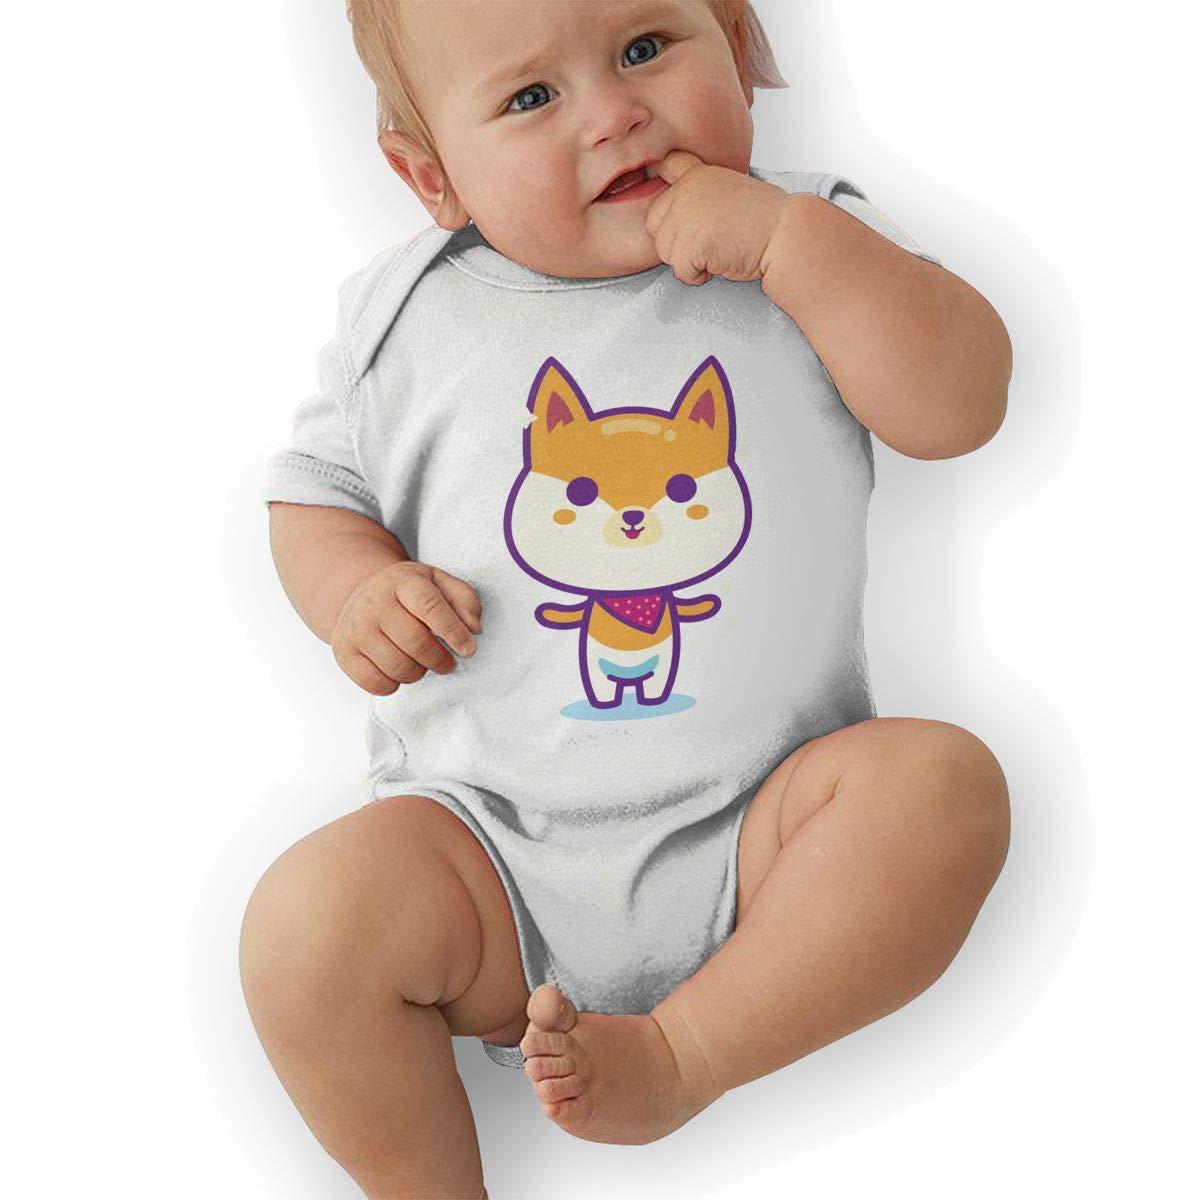 BONLOR Cute Shiba Inu Baby Boys Girls Jumpsuit Overall Romper Bodysuit Summer Clothes White